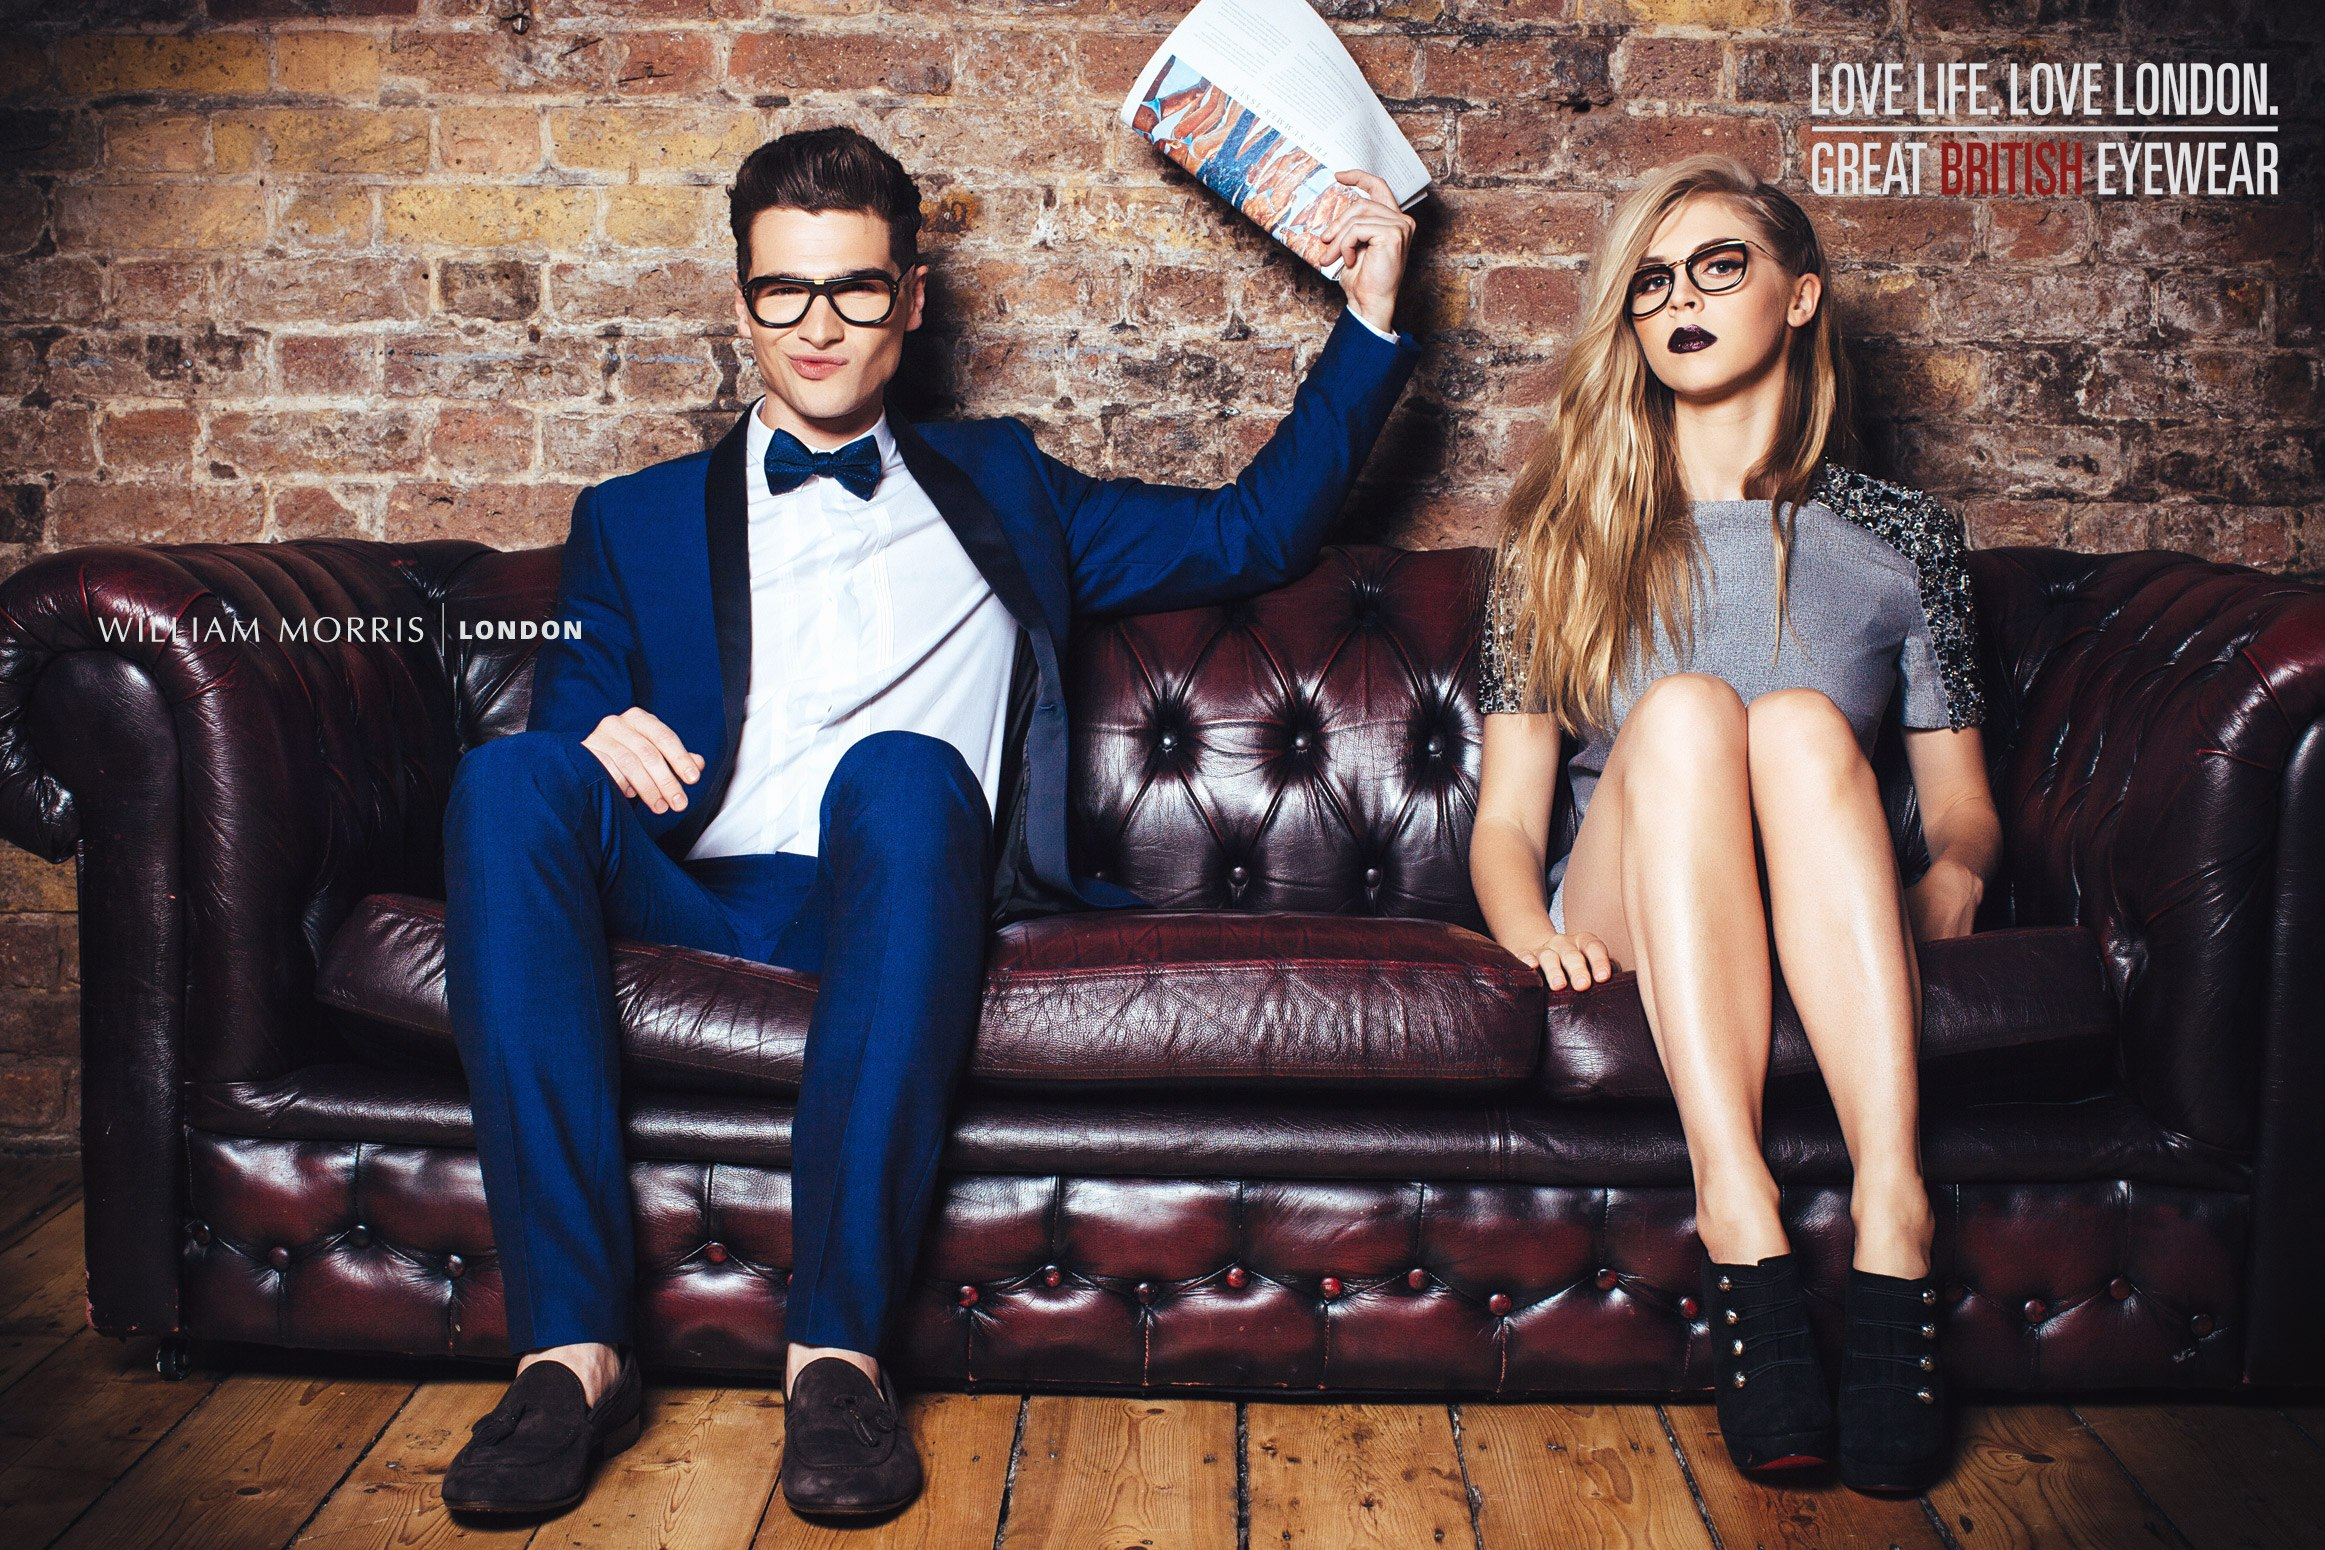 william-morris-london-2014-campaign-glasses-eyewear-brick-c9_0